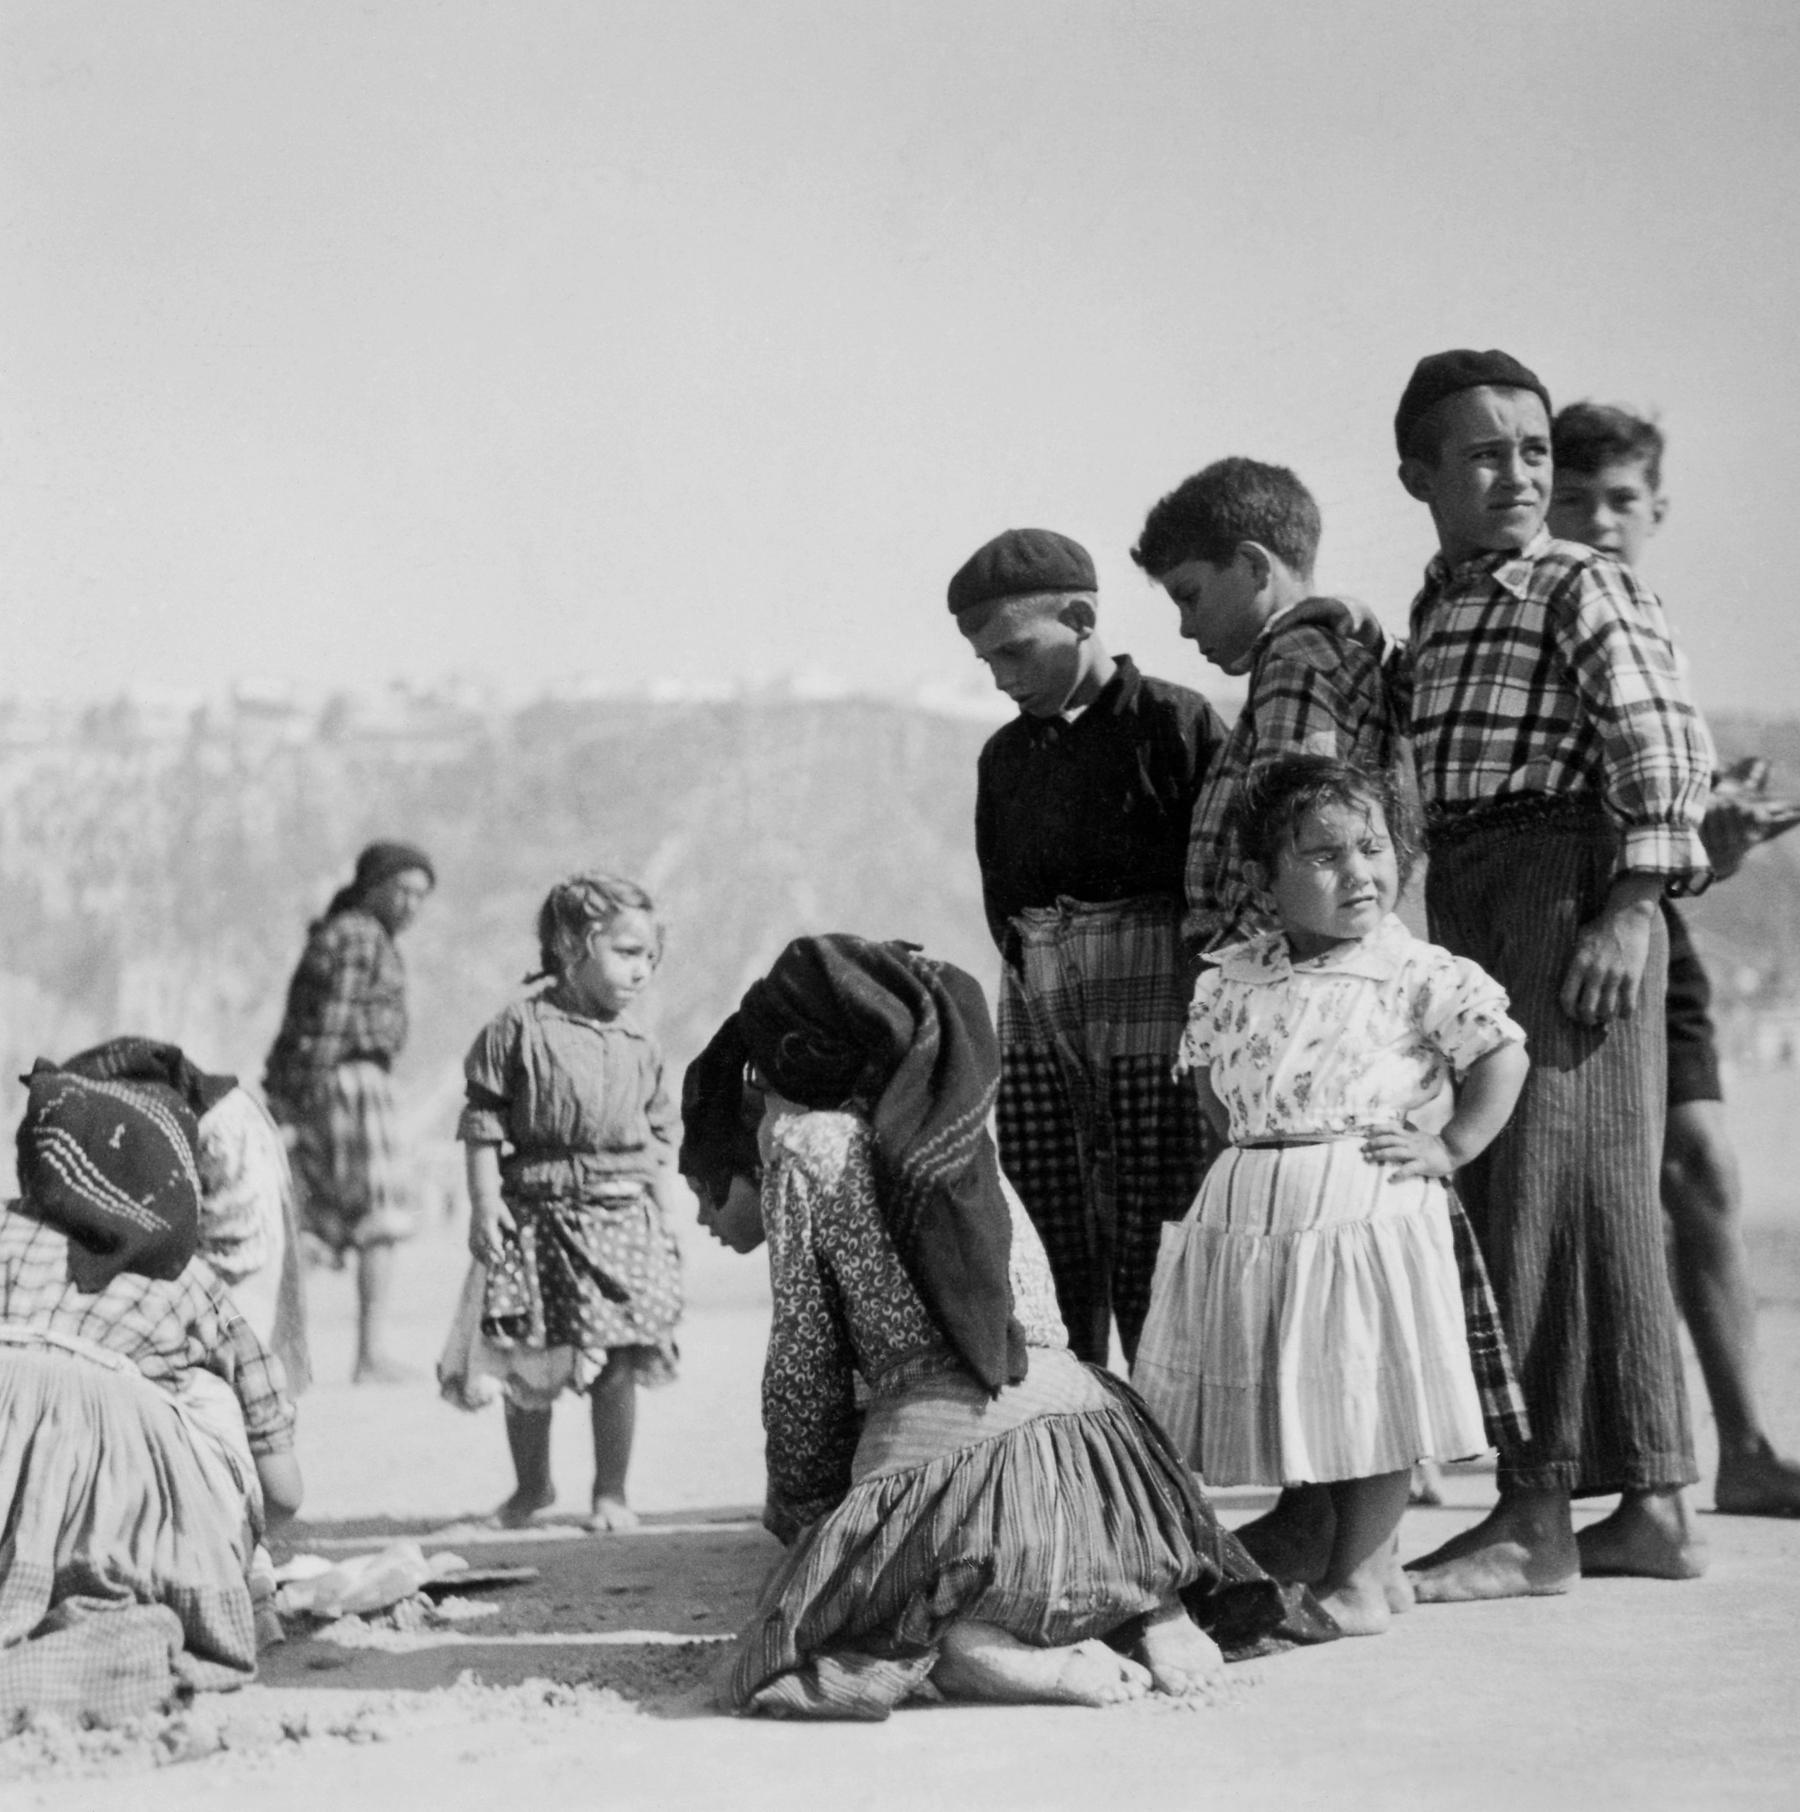 Fishermen's Kids, Nazaré, Portugal, 1947